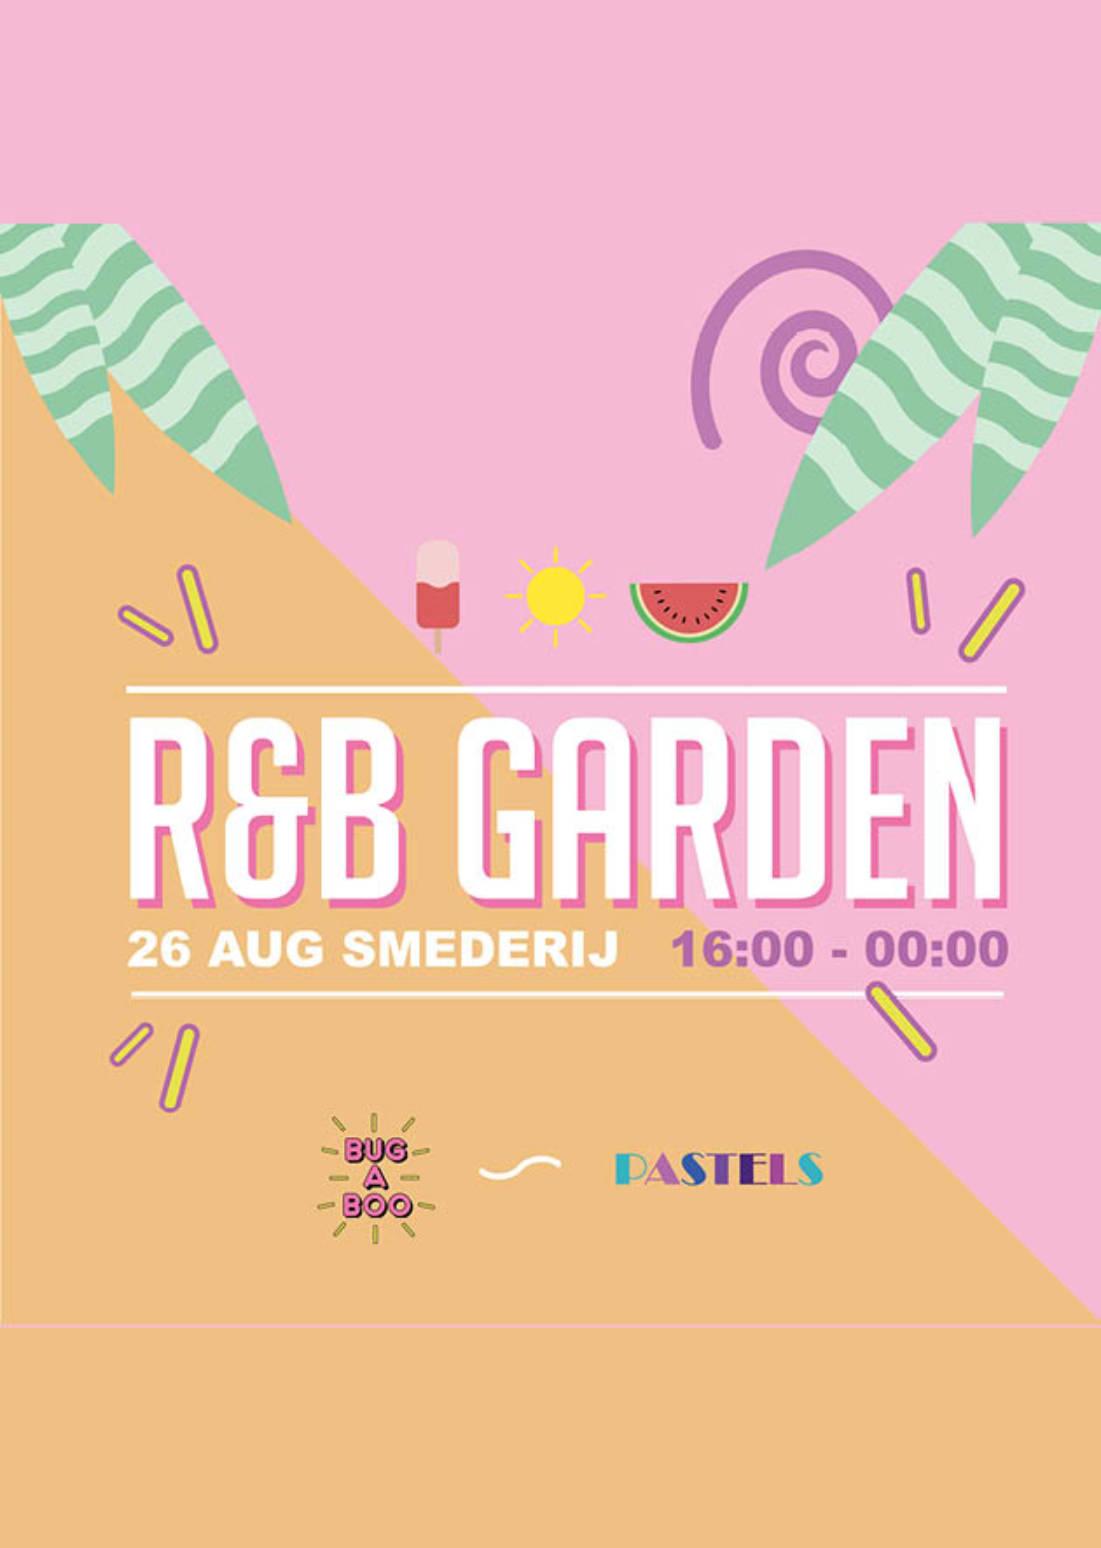 BUG A BOO X Pastels | R&B Garden